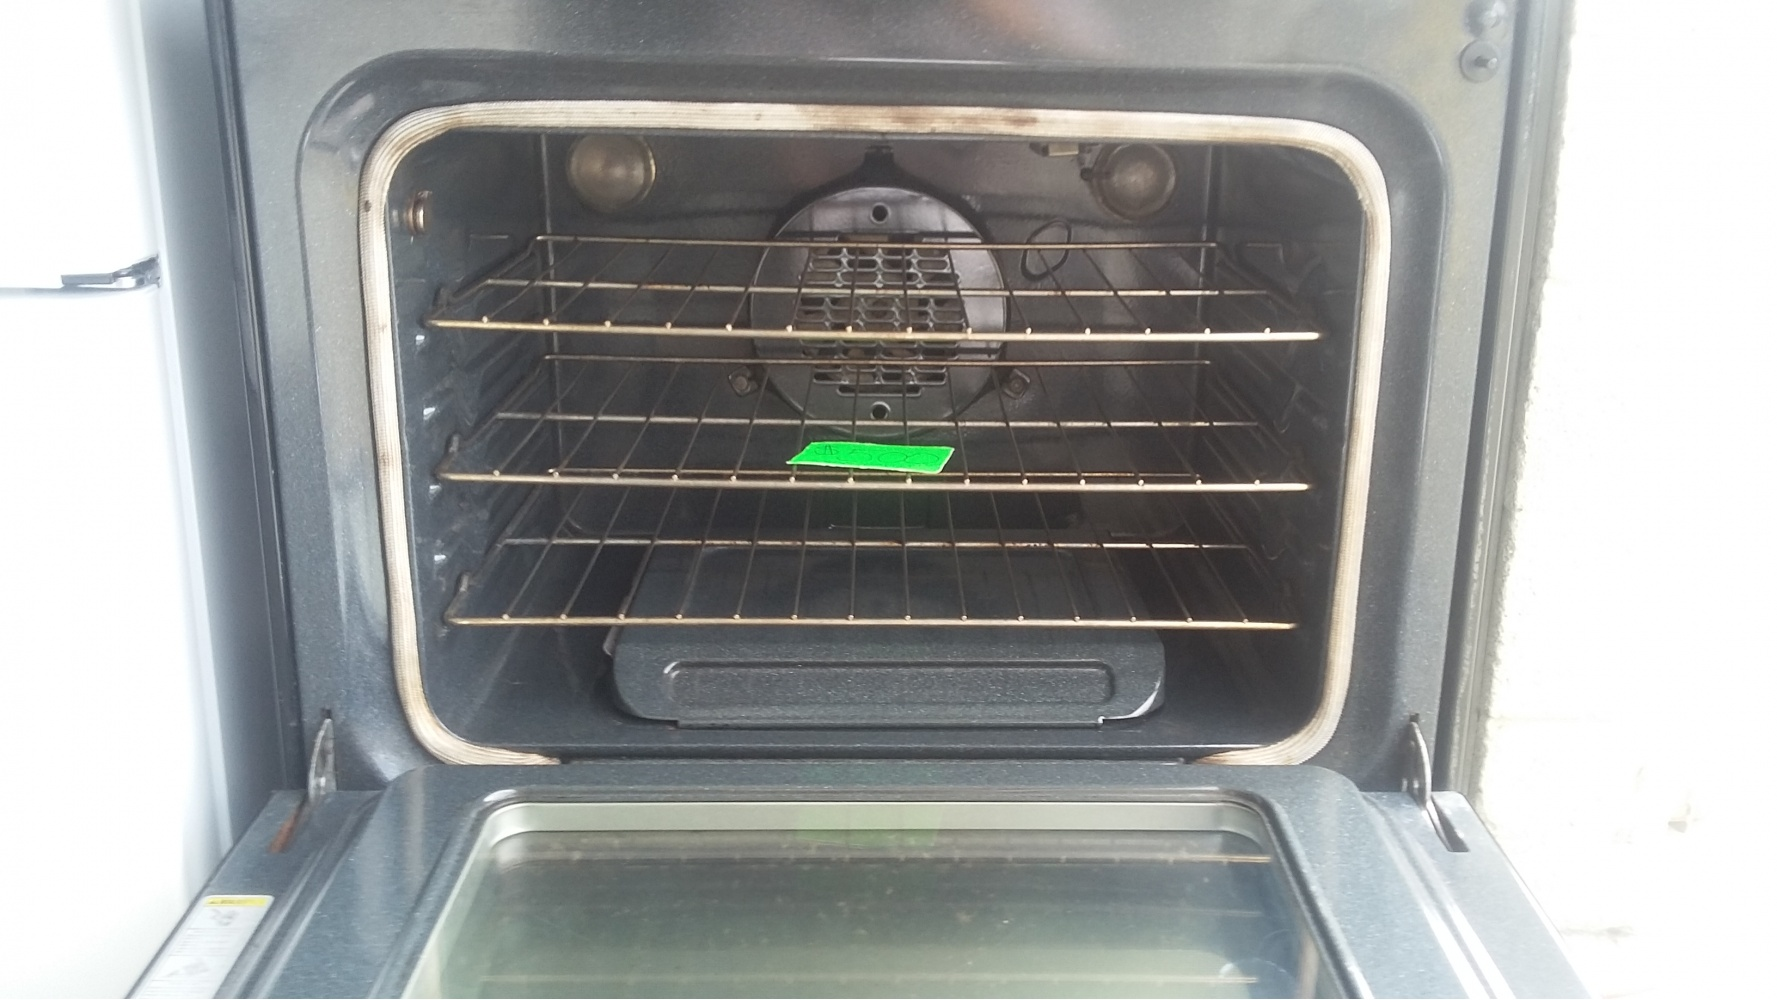 Kitchenaid Superba Stainless And Black 4 Burner Gas Range